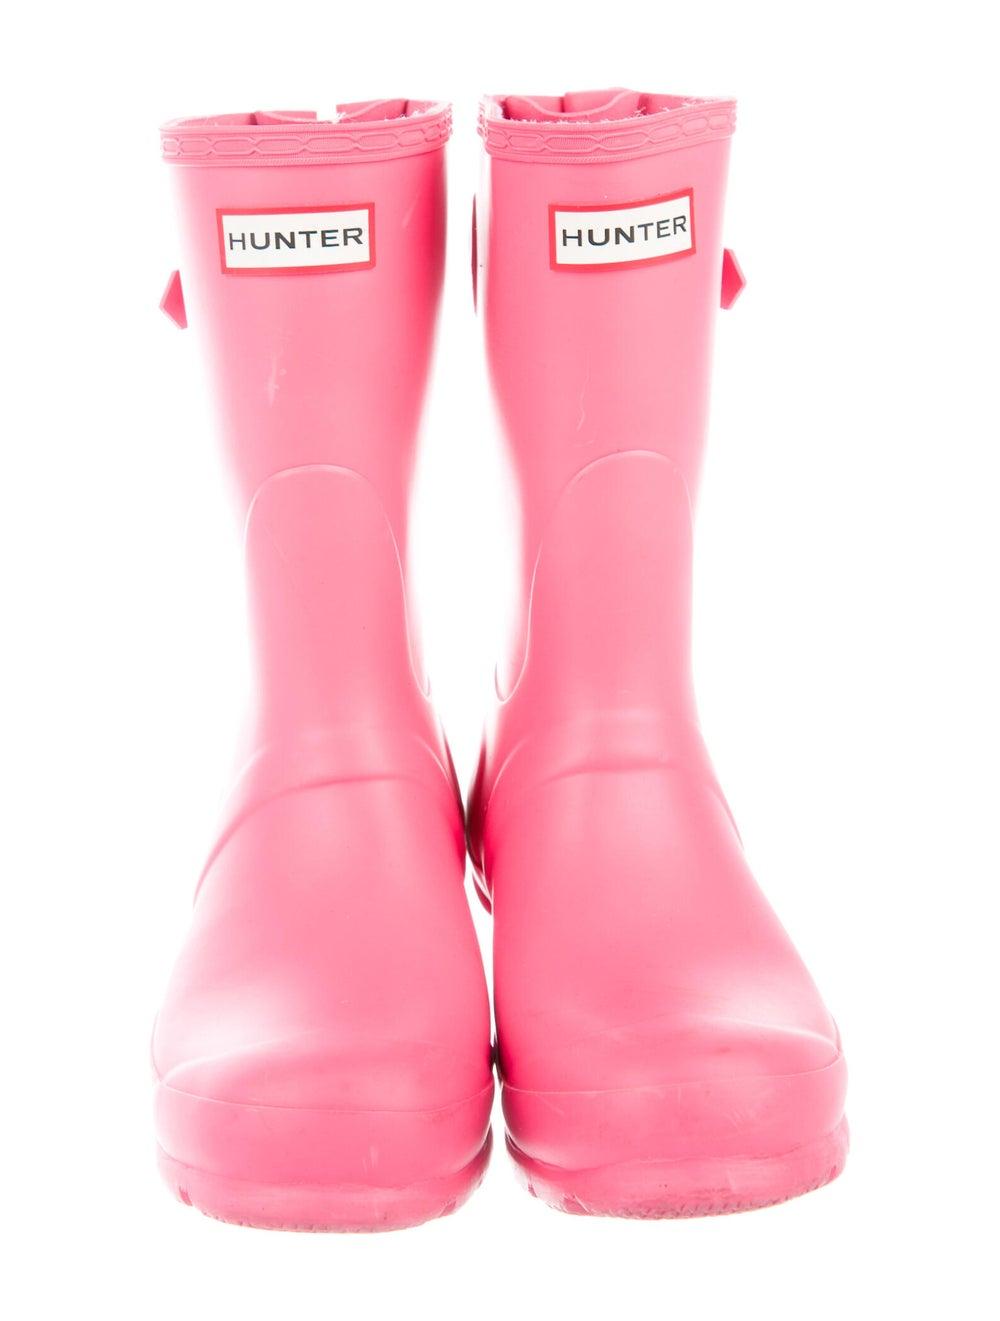 Hunter Rain Boots Pink - image 3